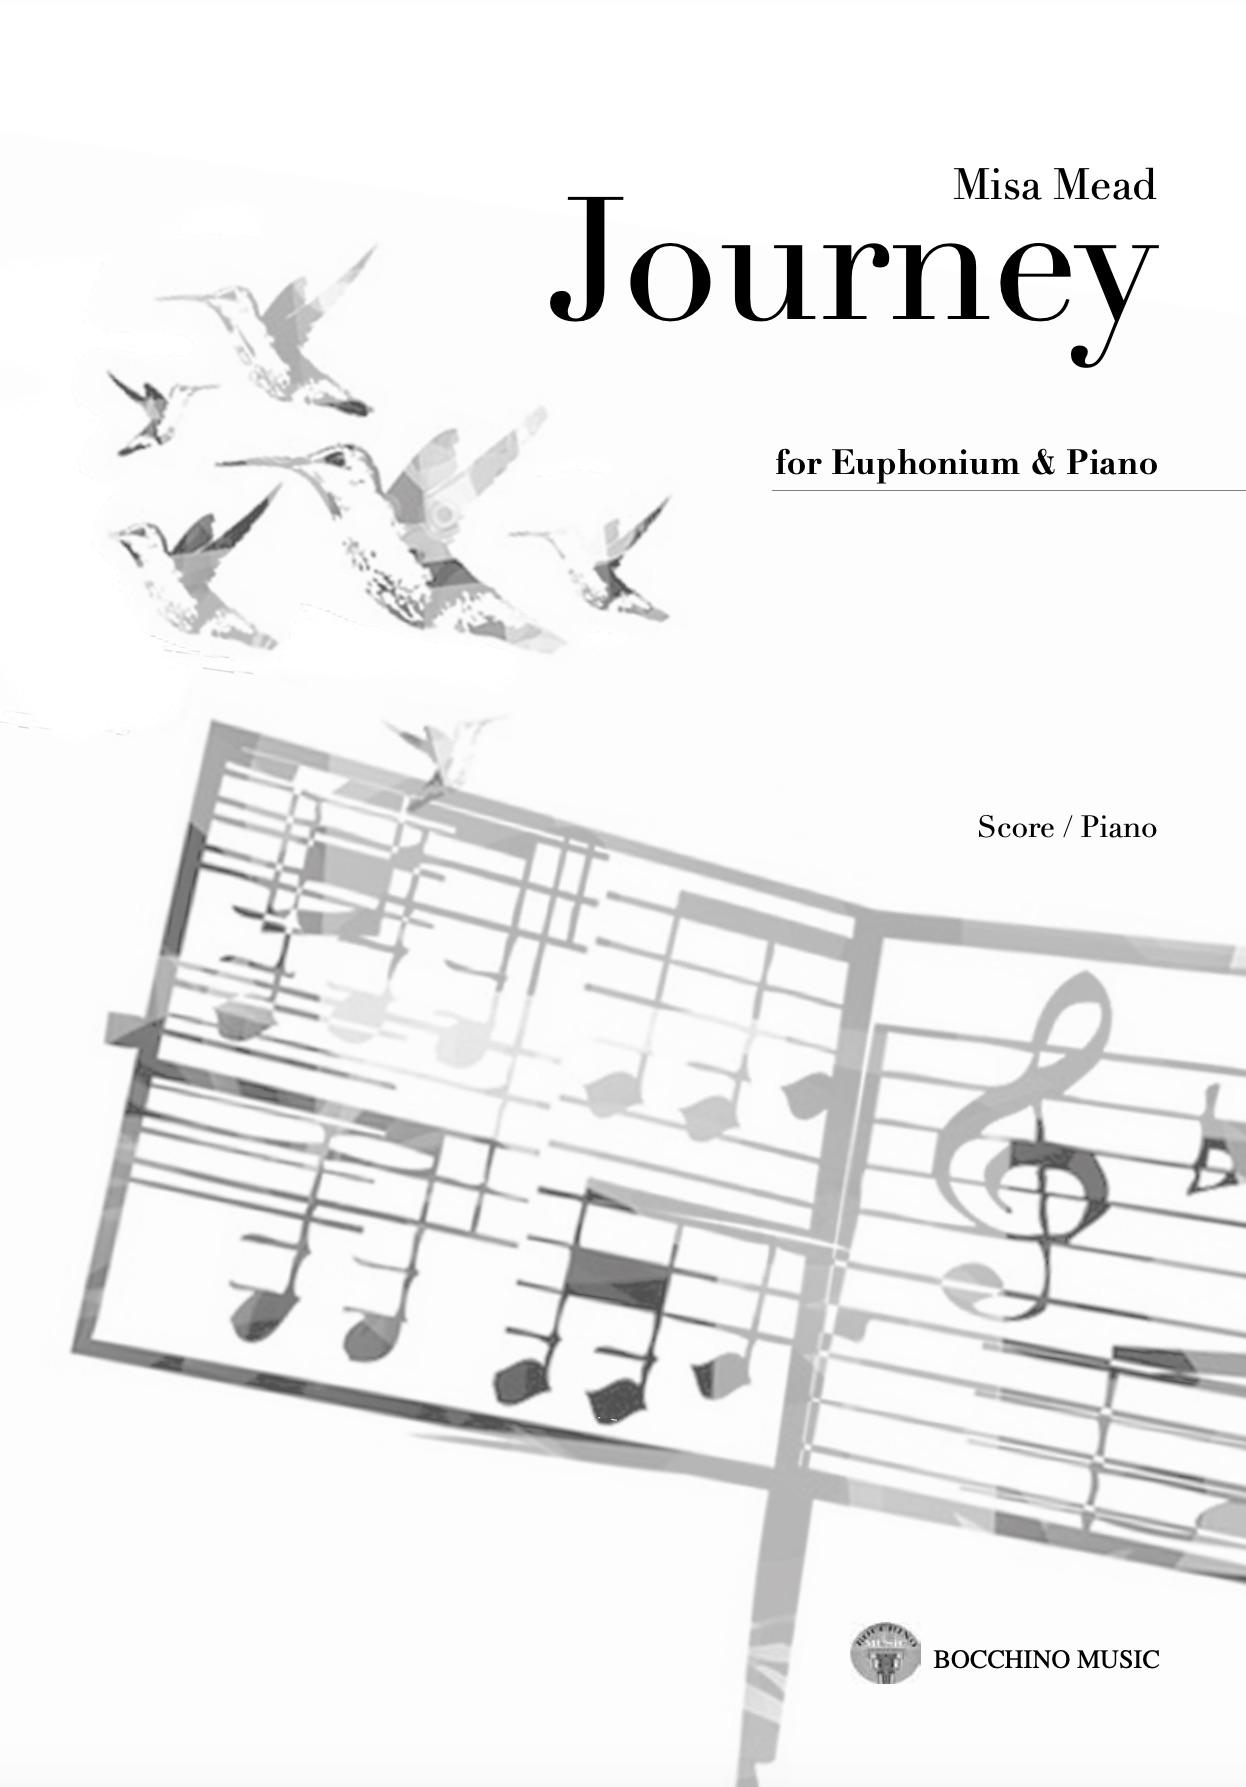 Journey - Misa Mead - Euphonium and Piano